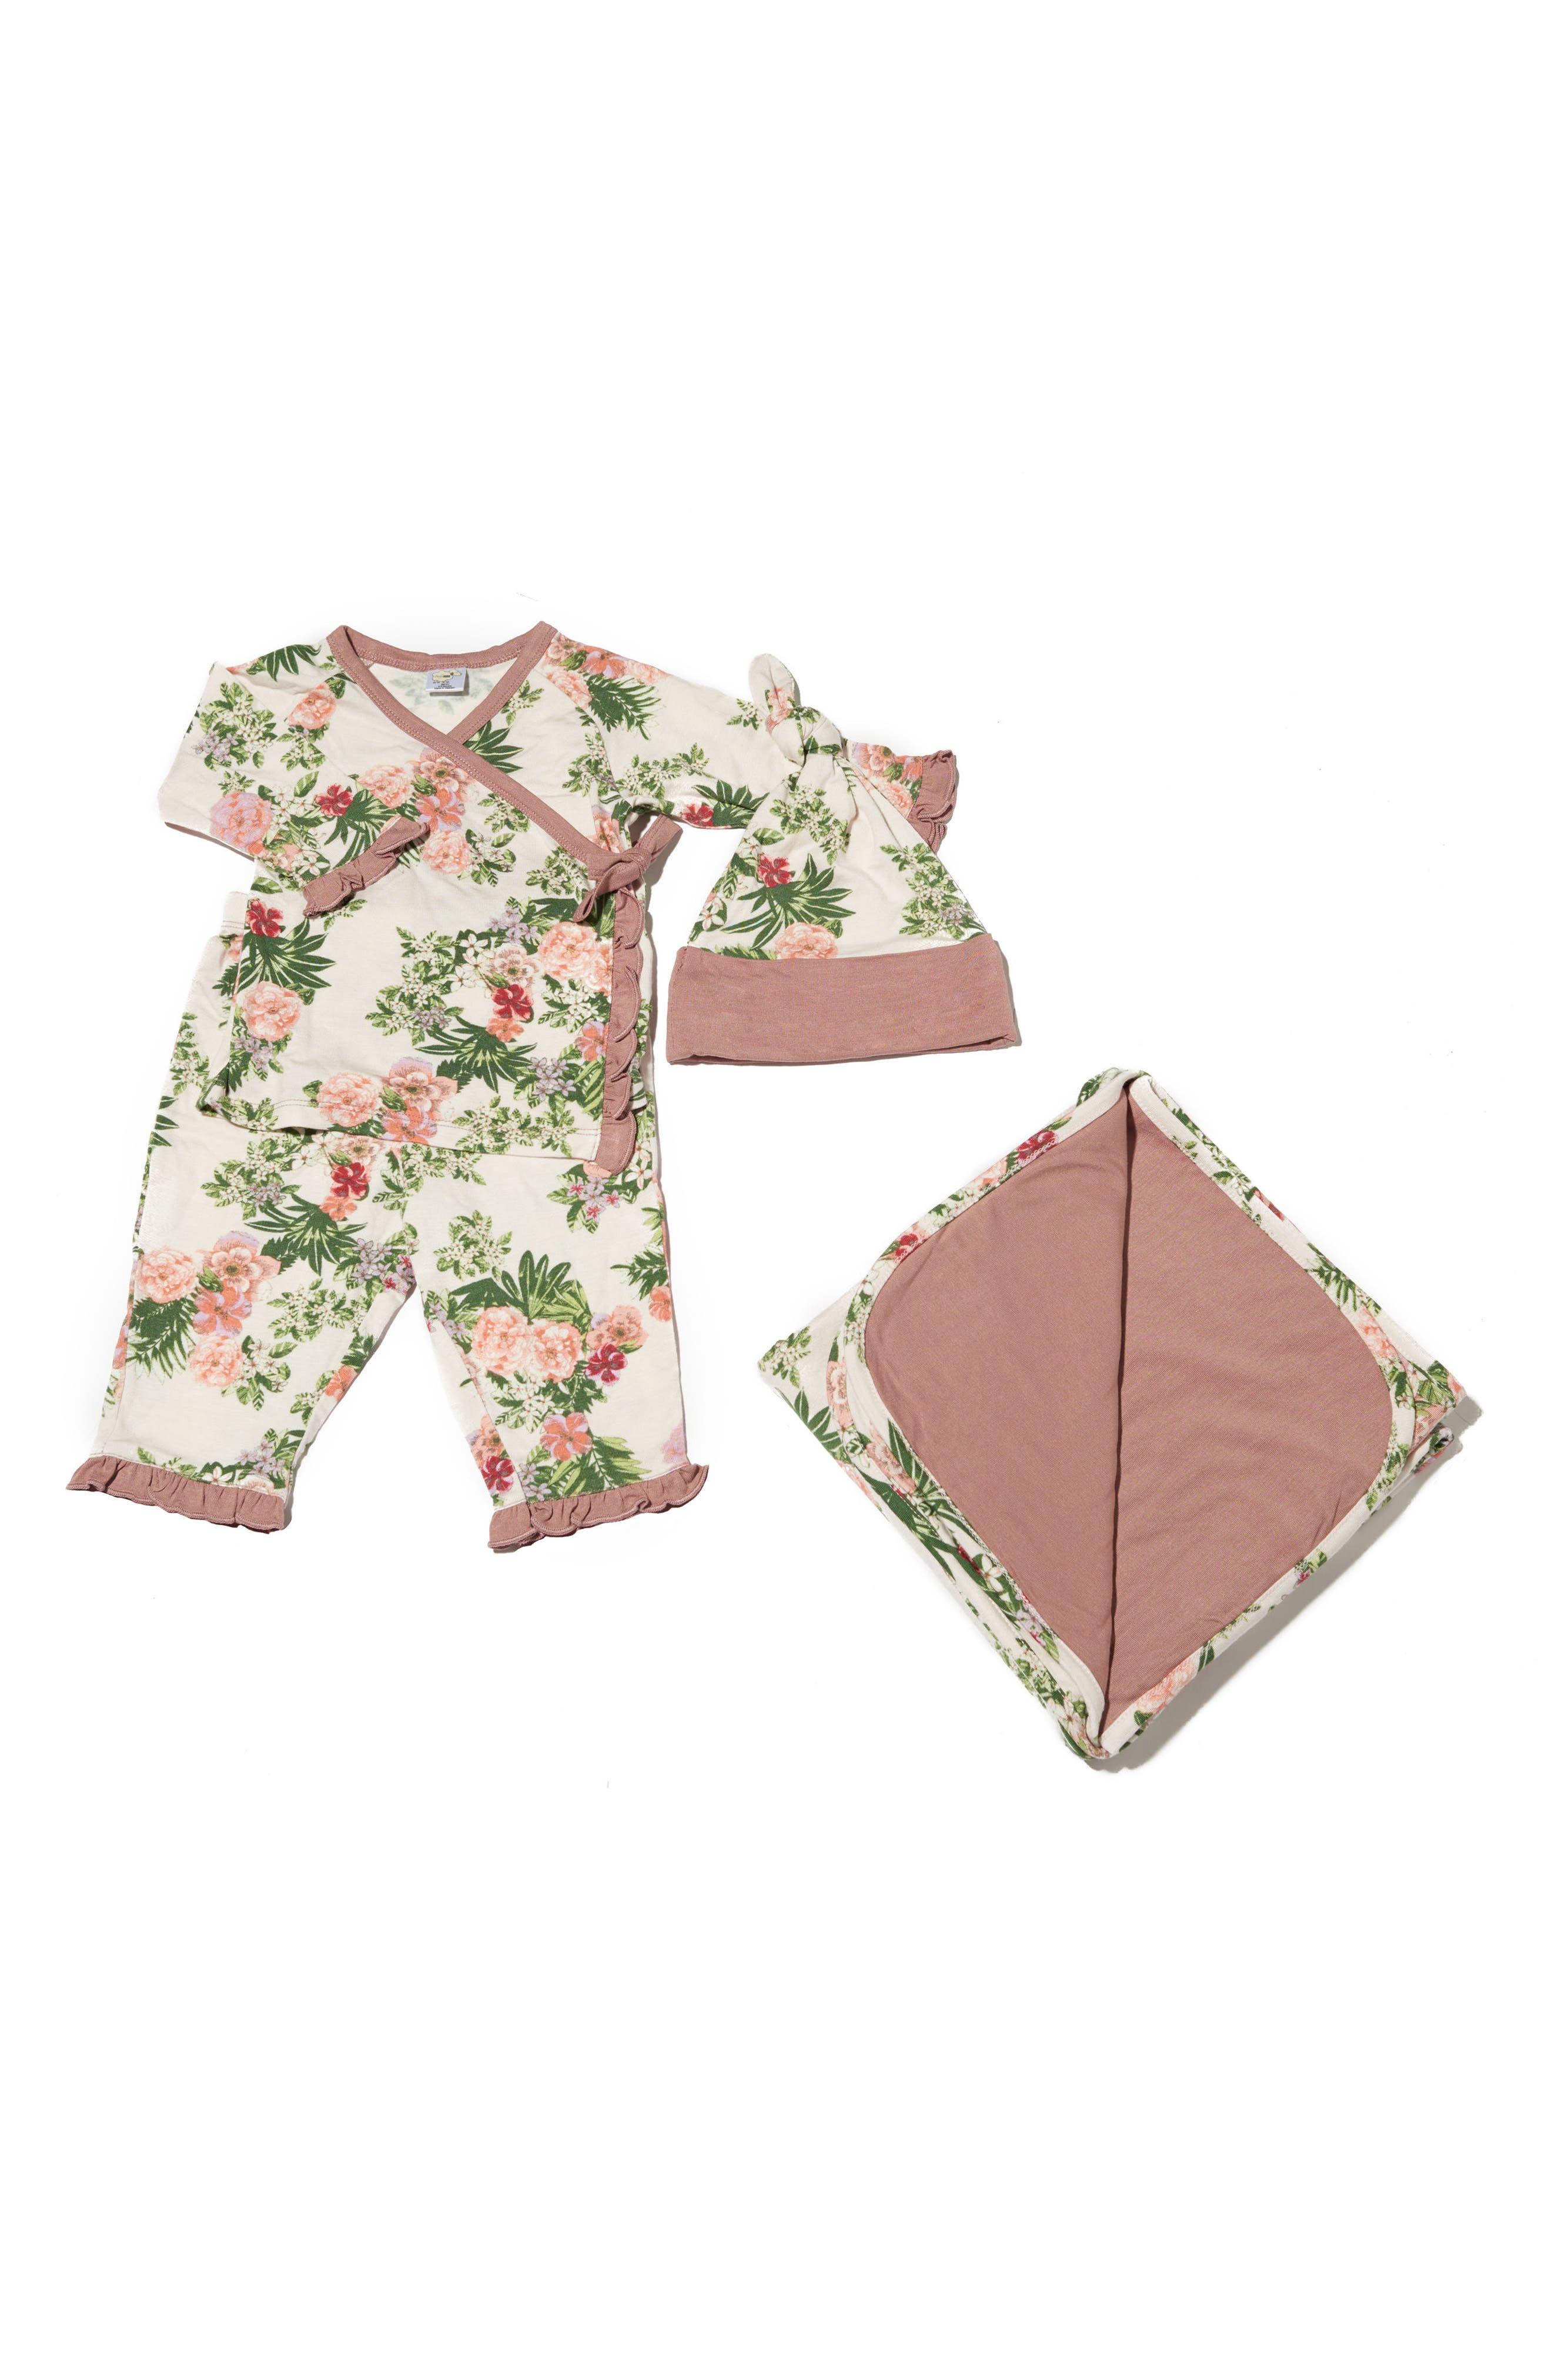 Ruffle Wrap Top, Pants, Hat & Blanket Set, Main, color, 250